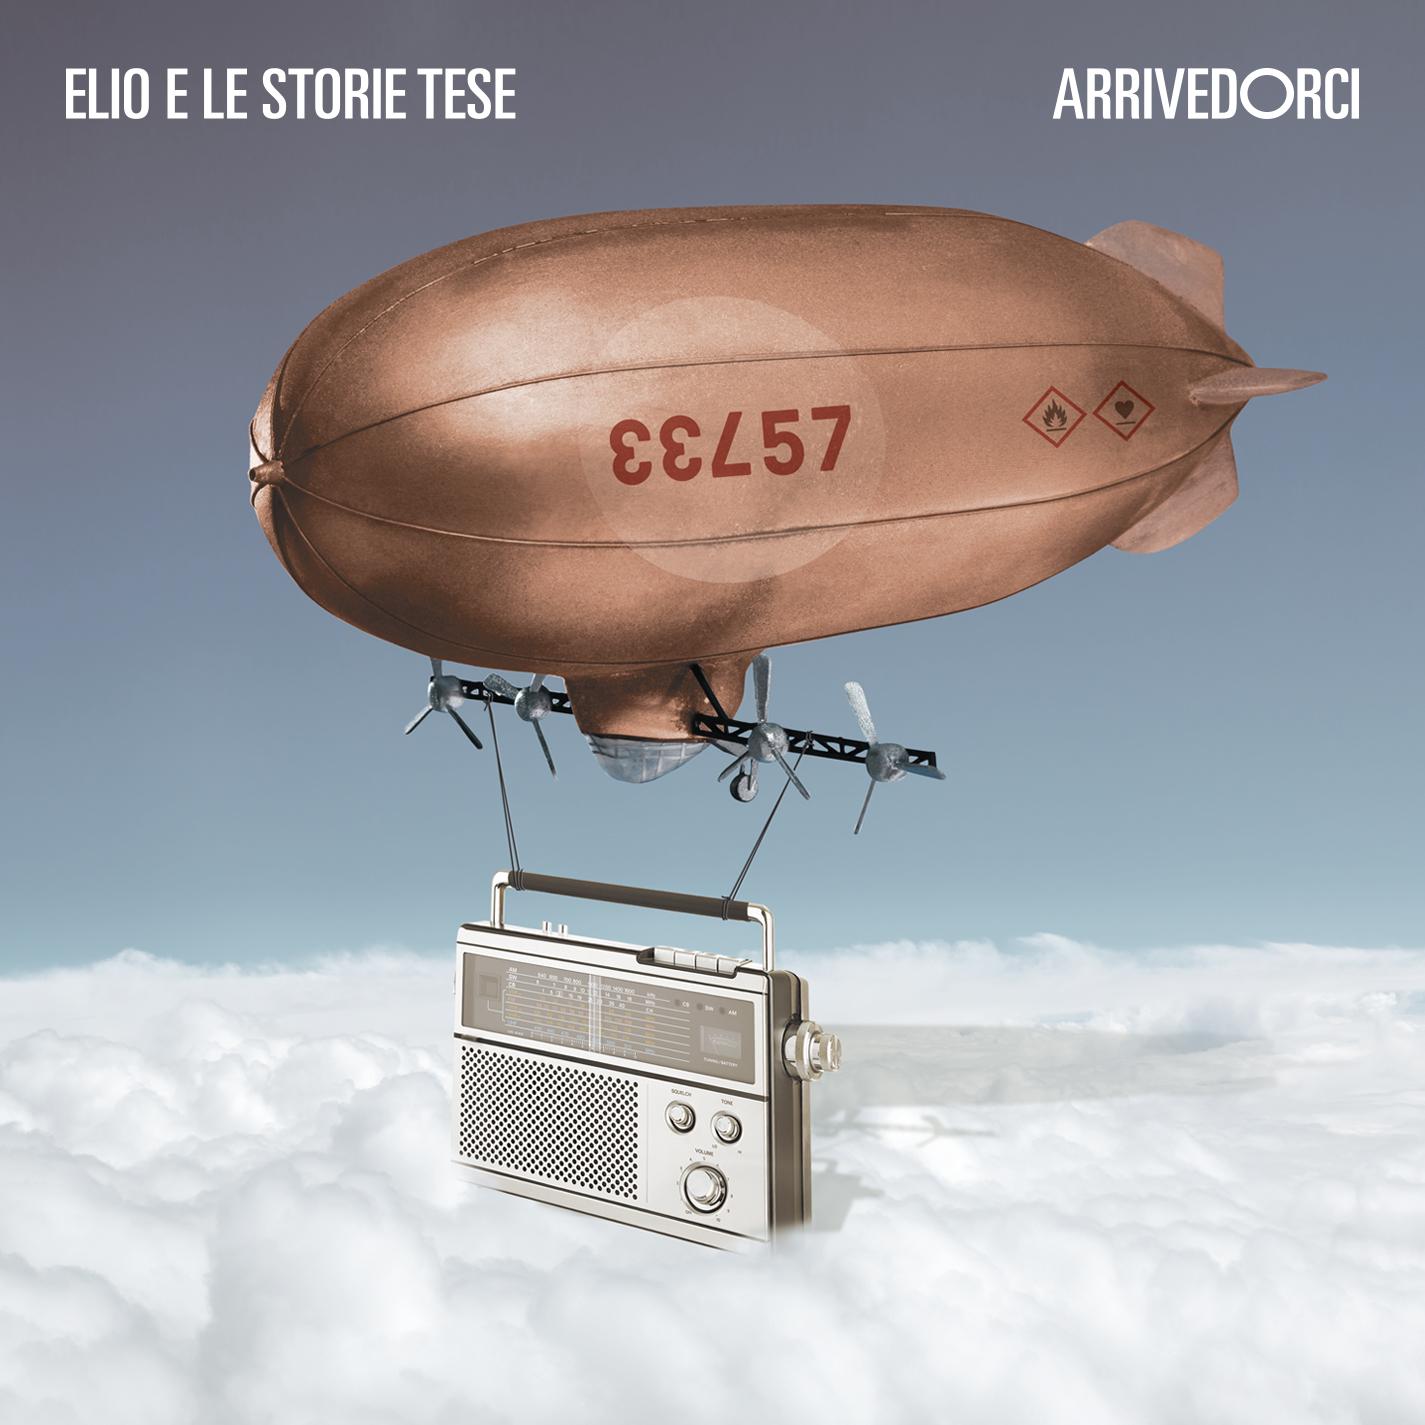 ELIO E LE STORIE TESE - ARRIVEDORCI -2CD (CD)